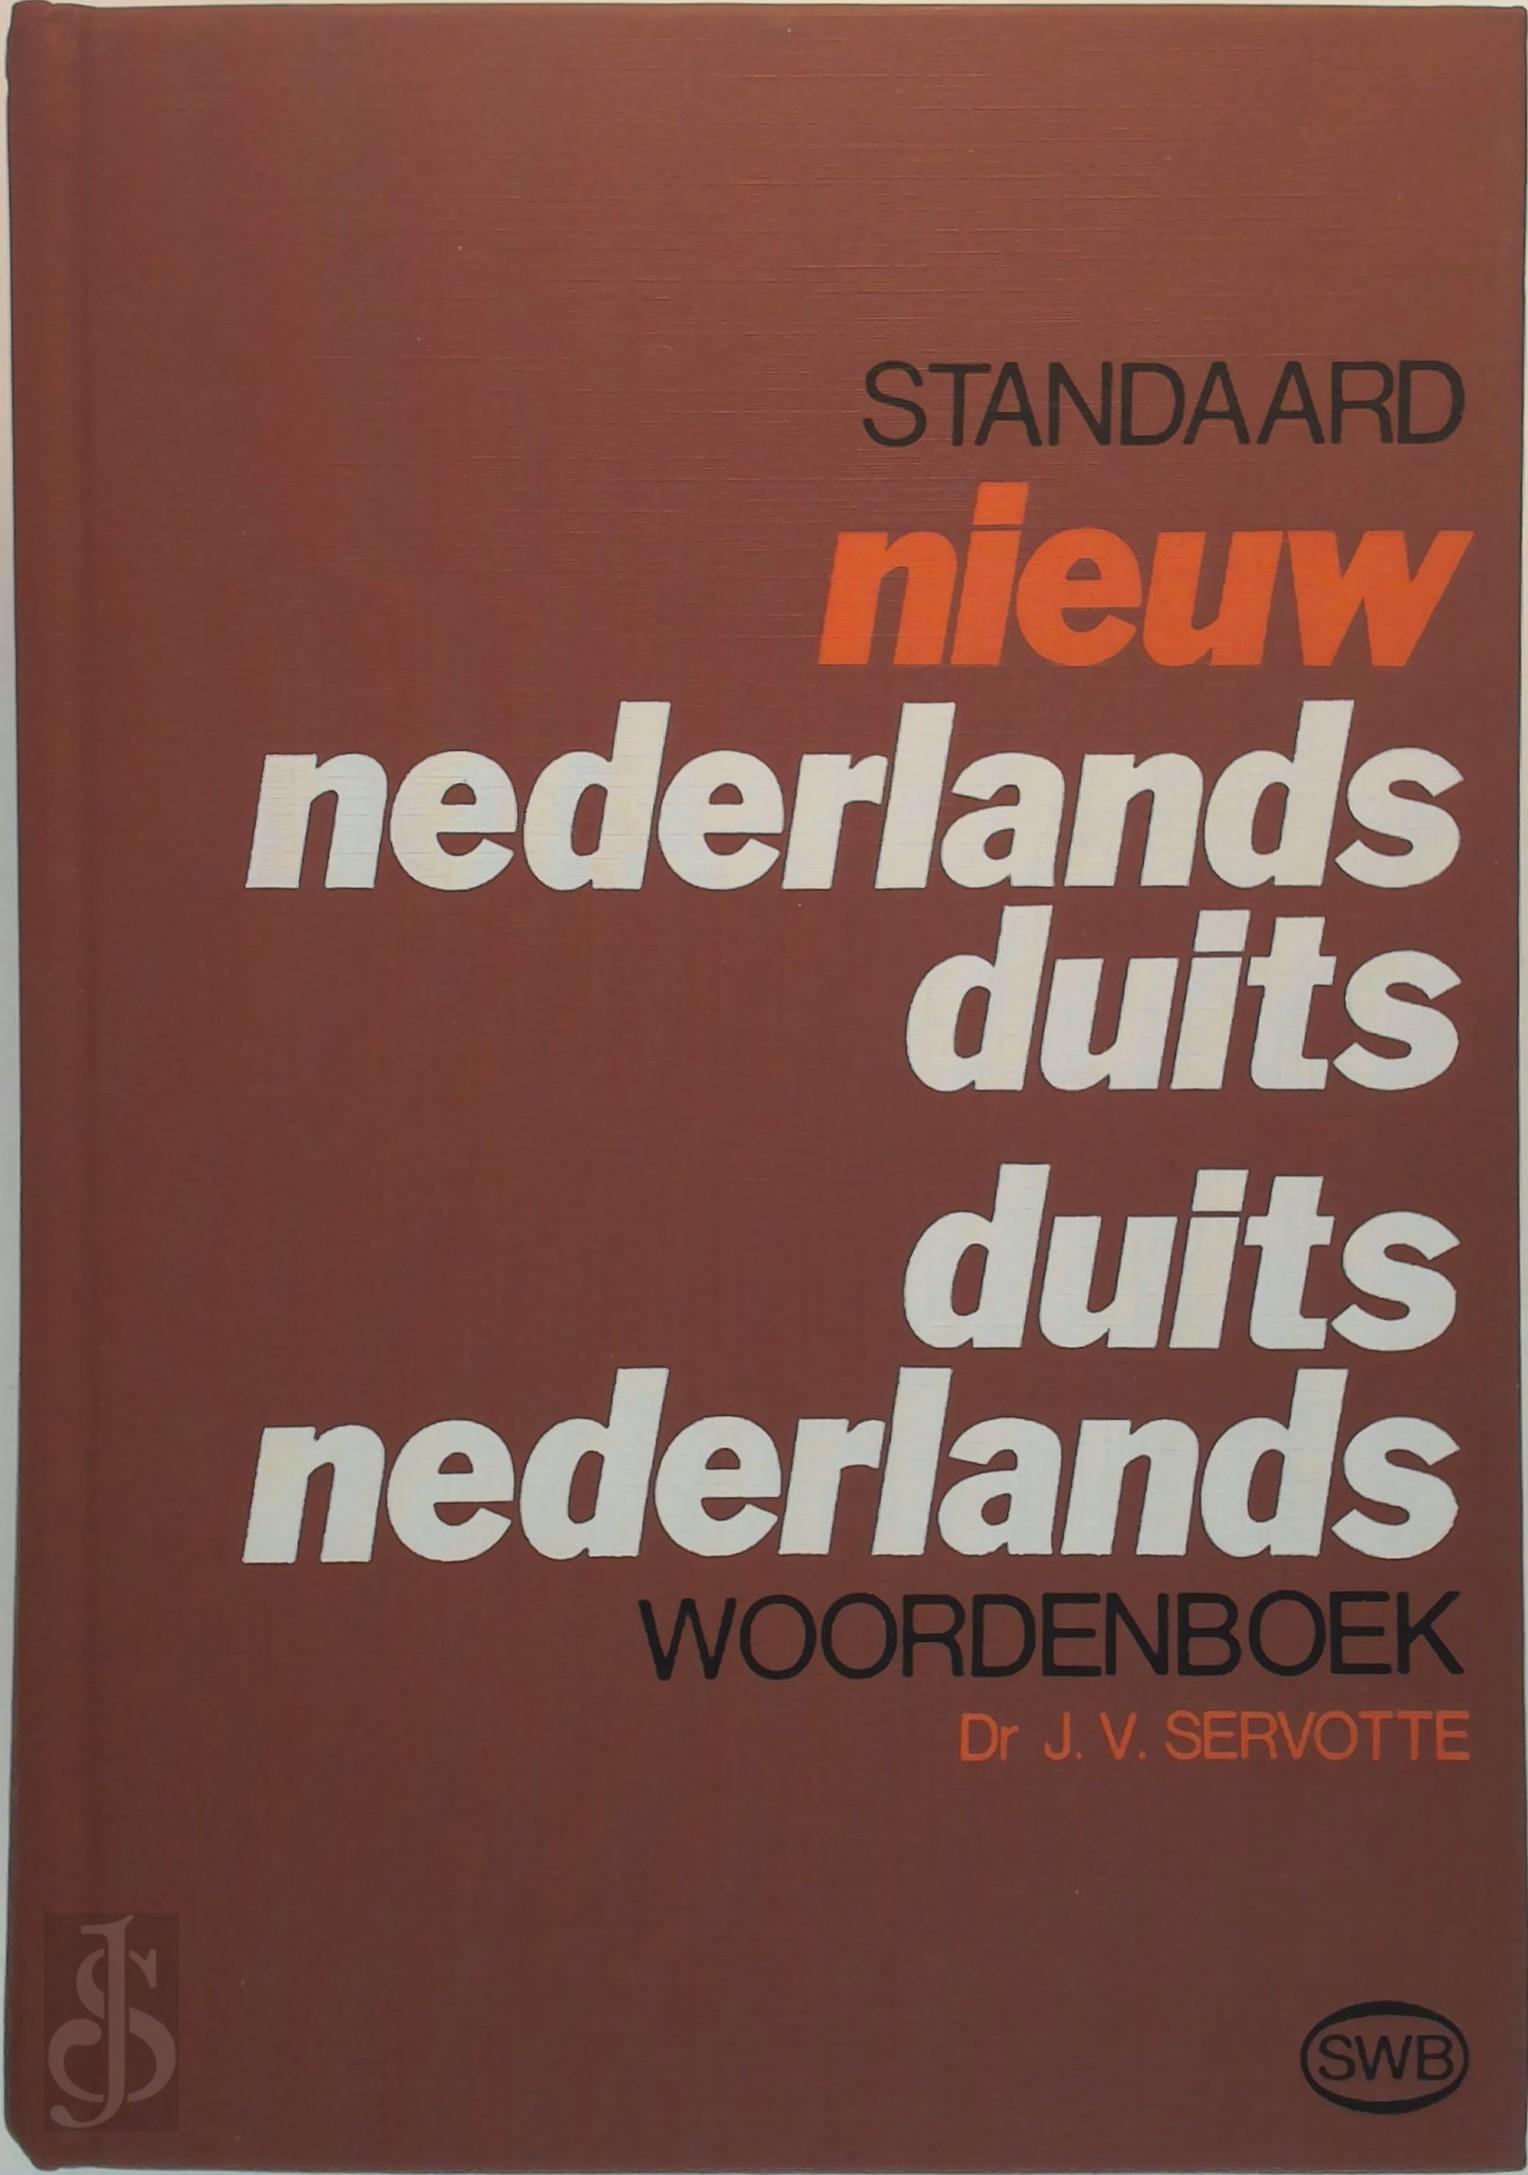 Nieuw nederlands-duits, dui...